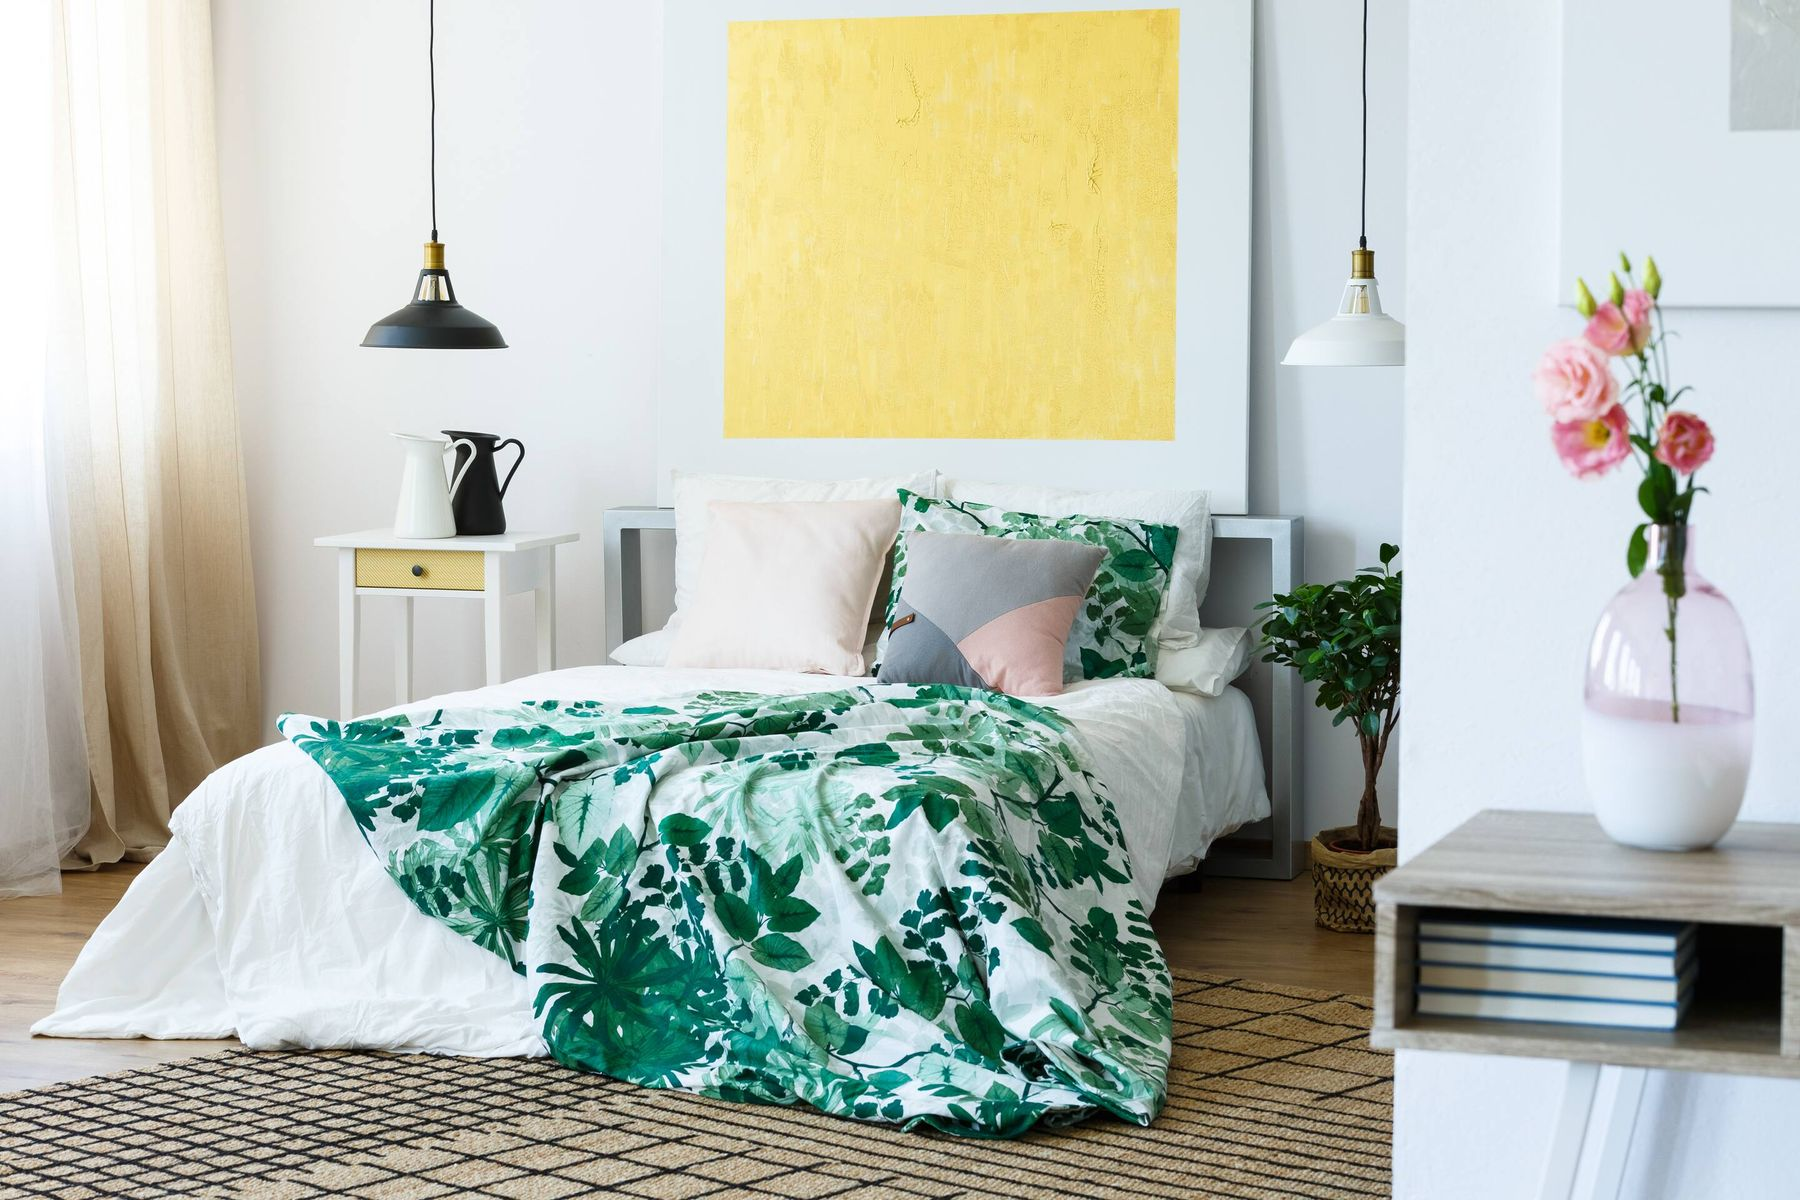 how to soundproof a room: quiet bedroom